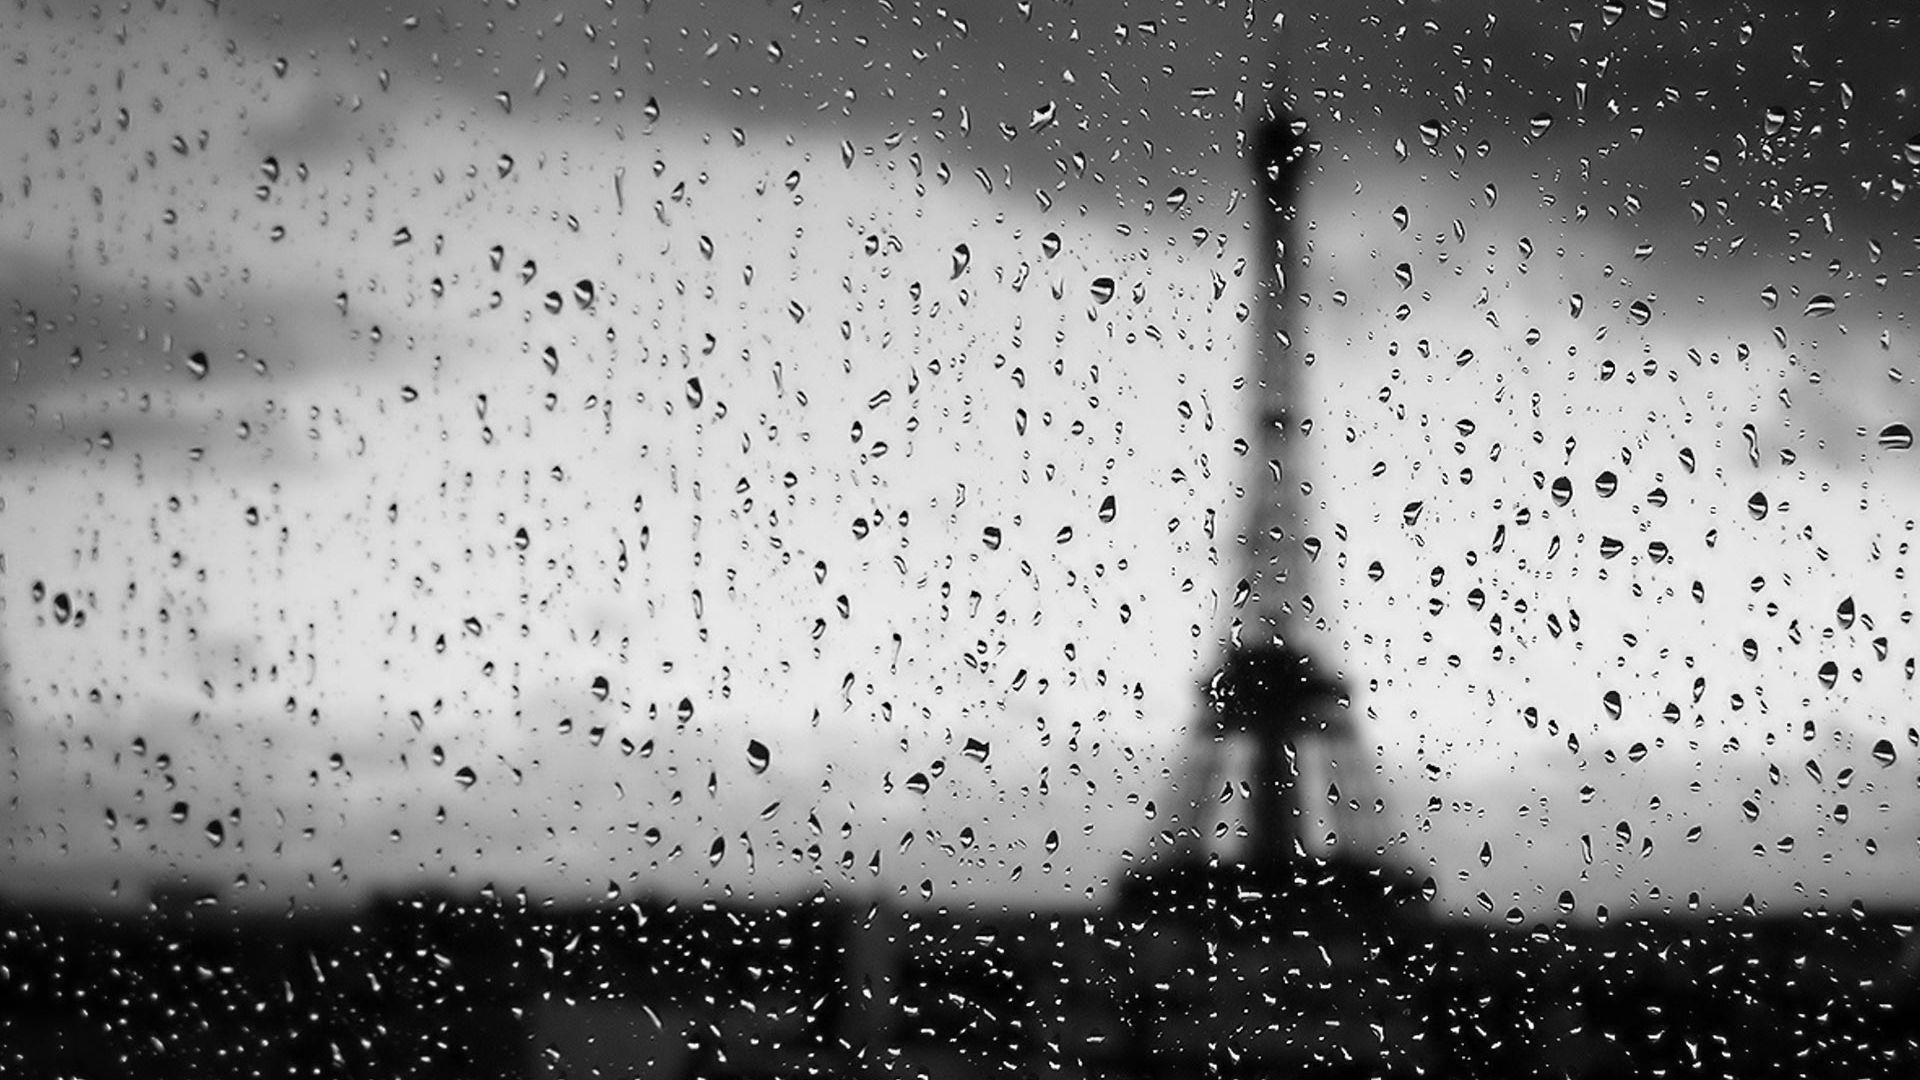 Wallpaper Eiffel tower of Paris through water drops window surface